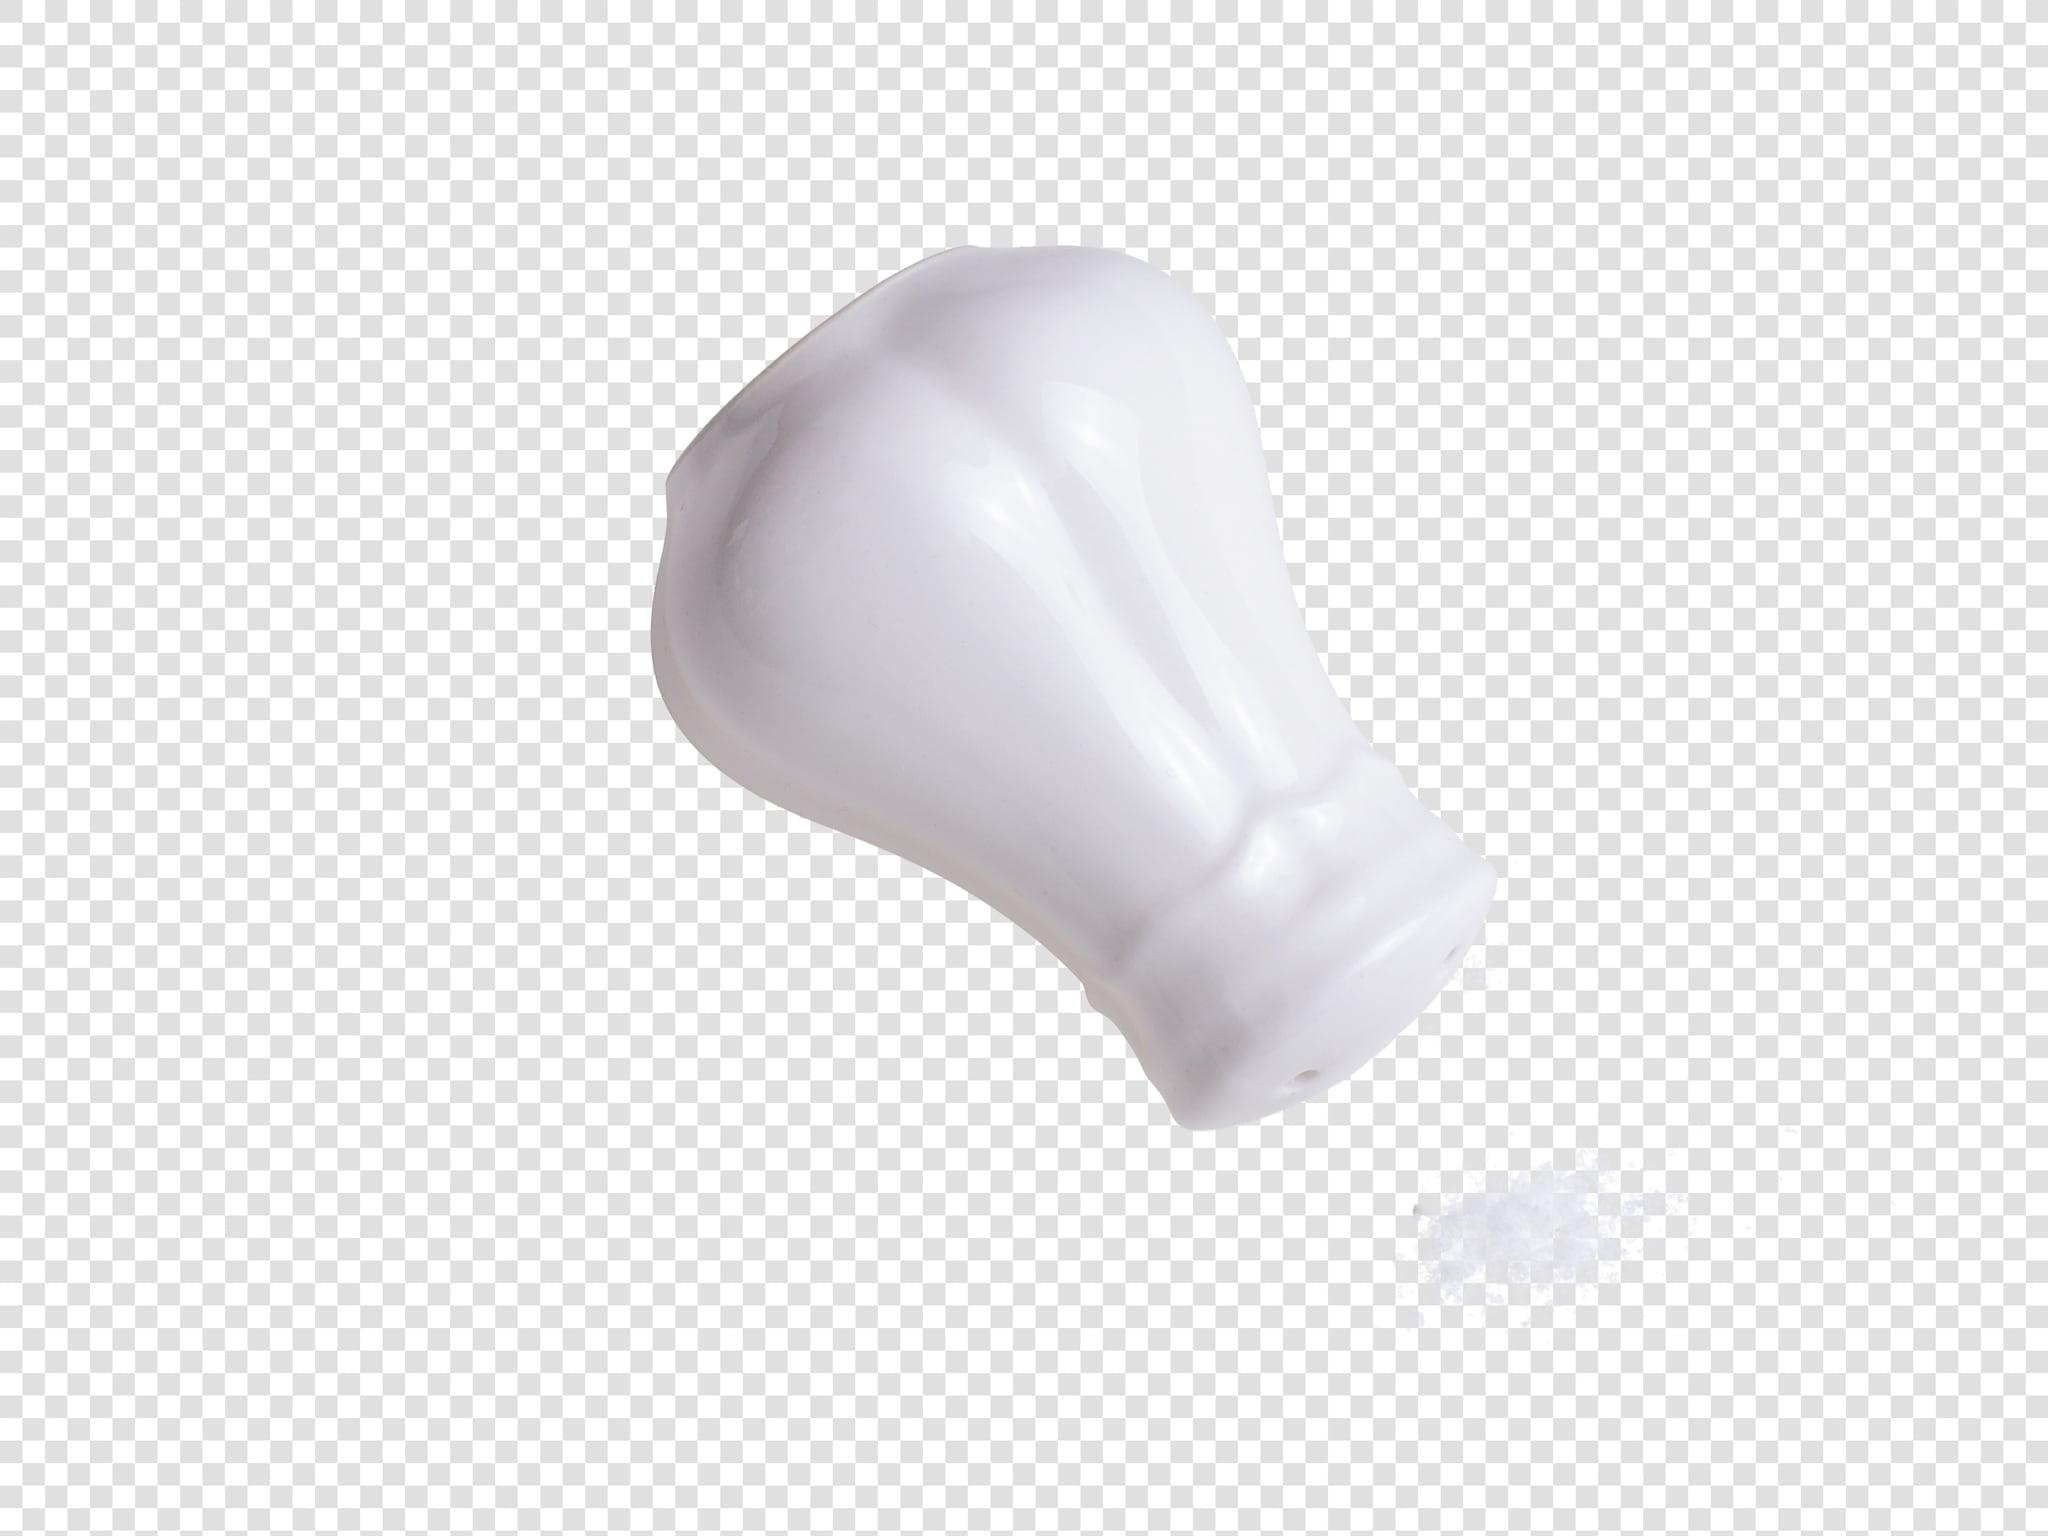 Salt shaker PSD isolated image